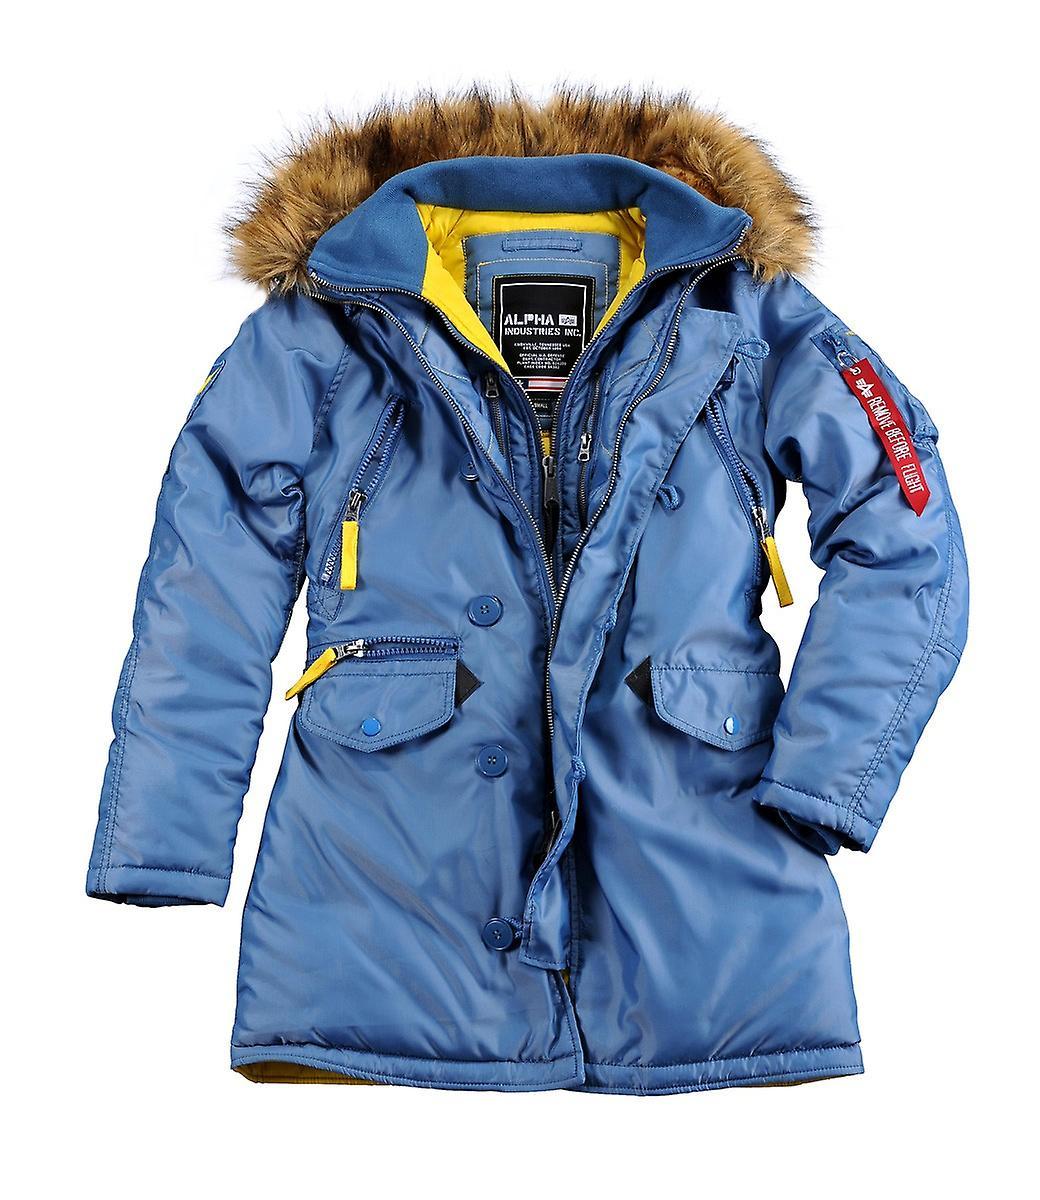 Alpha Industries Jacket PPS N3B Burgundy